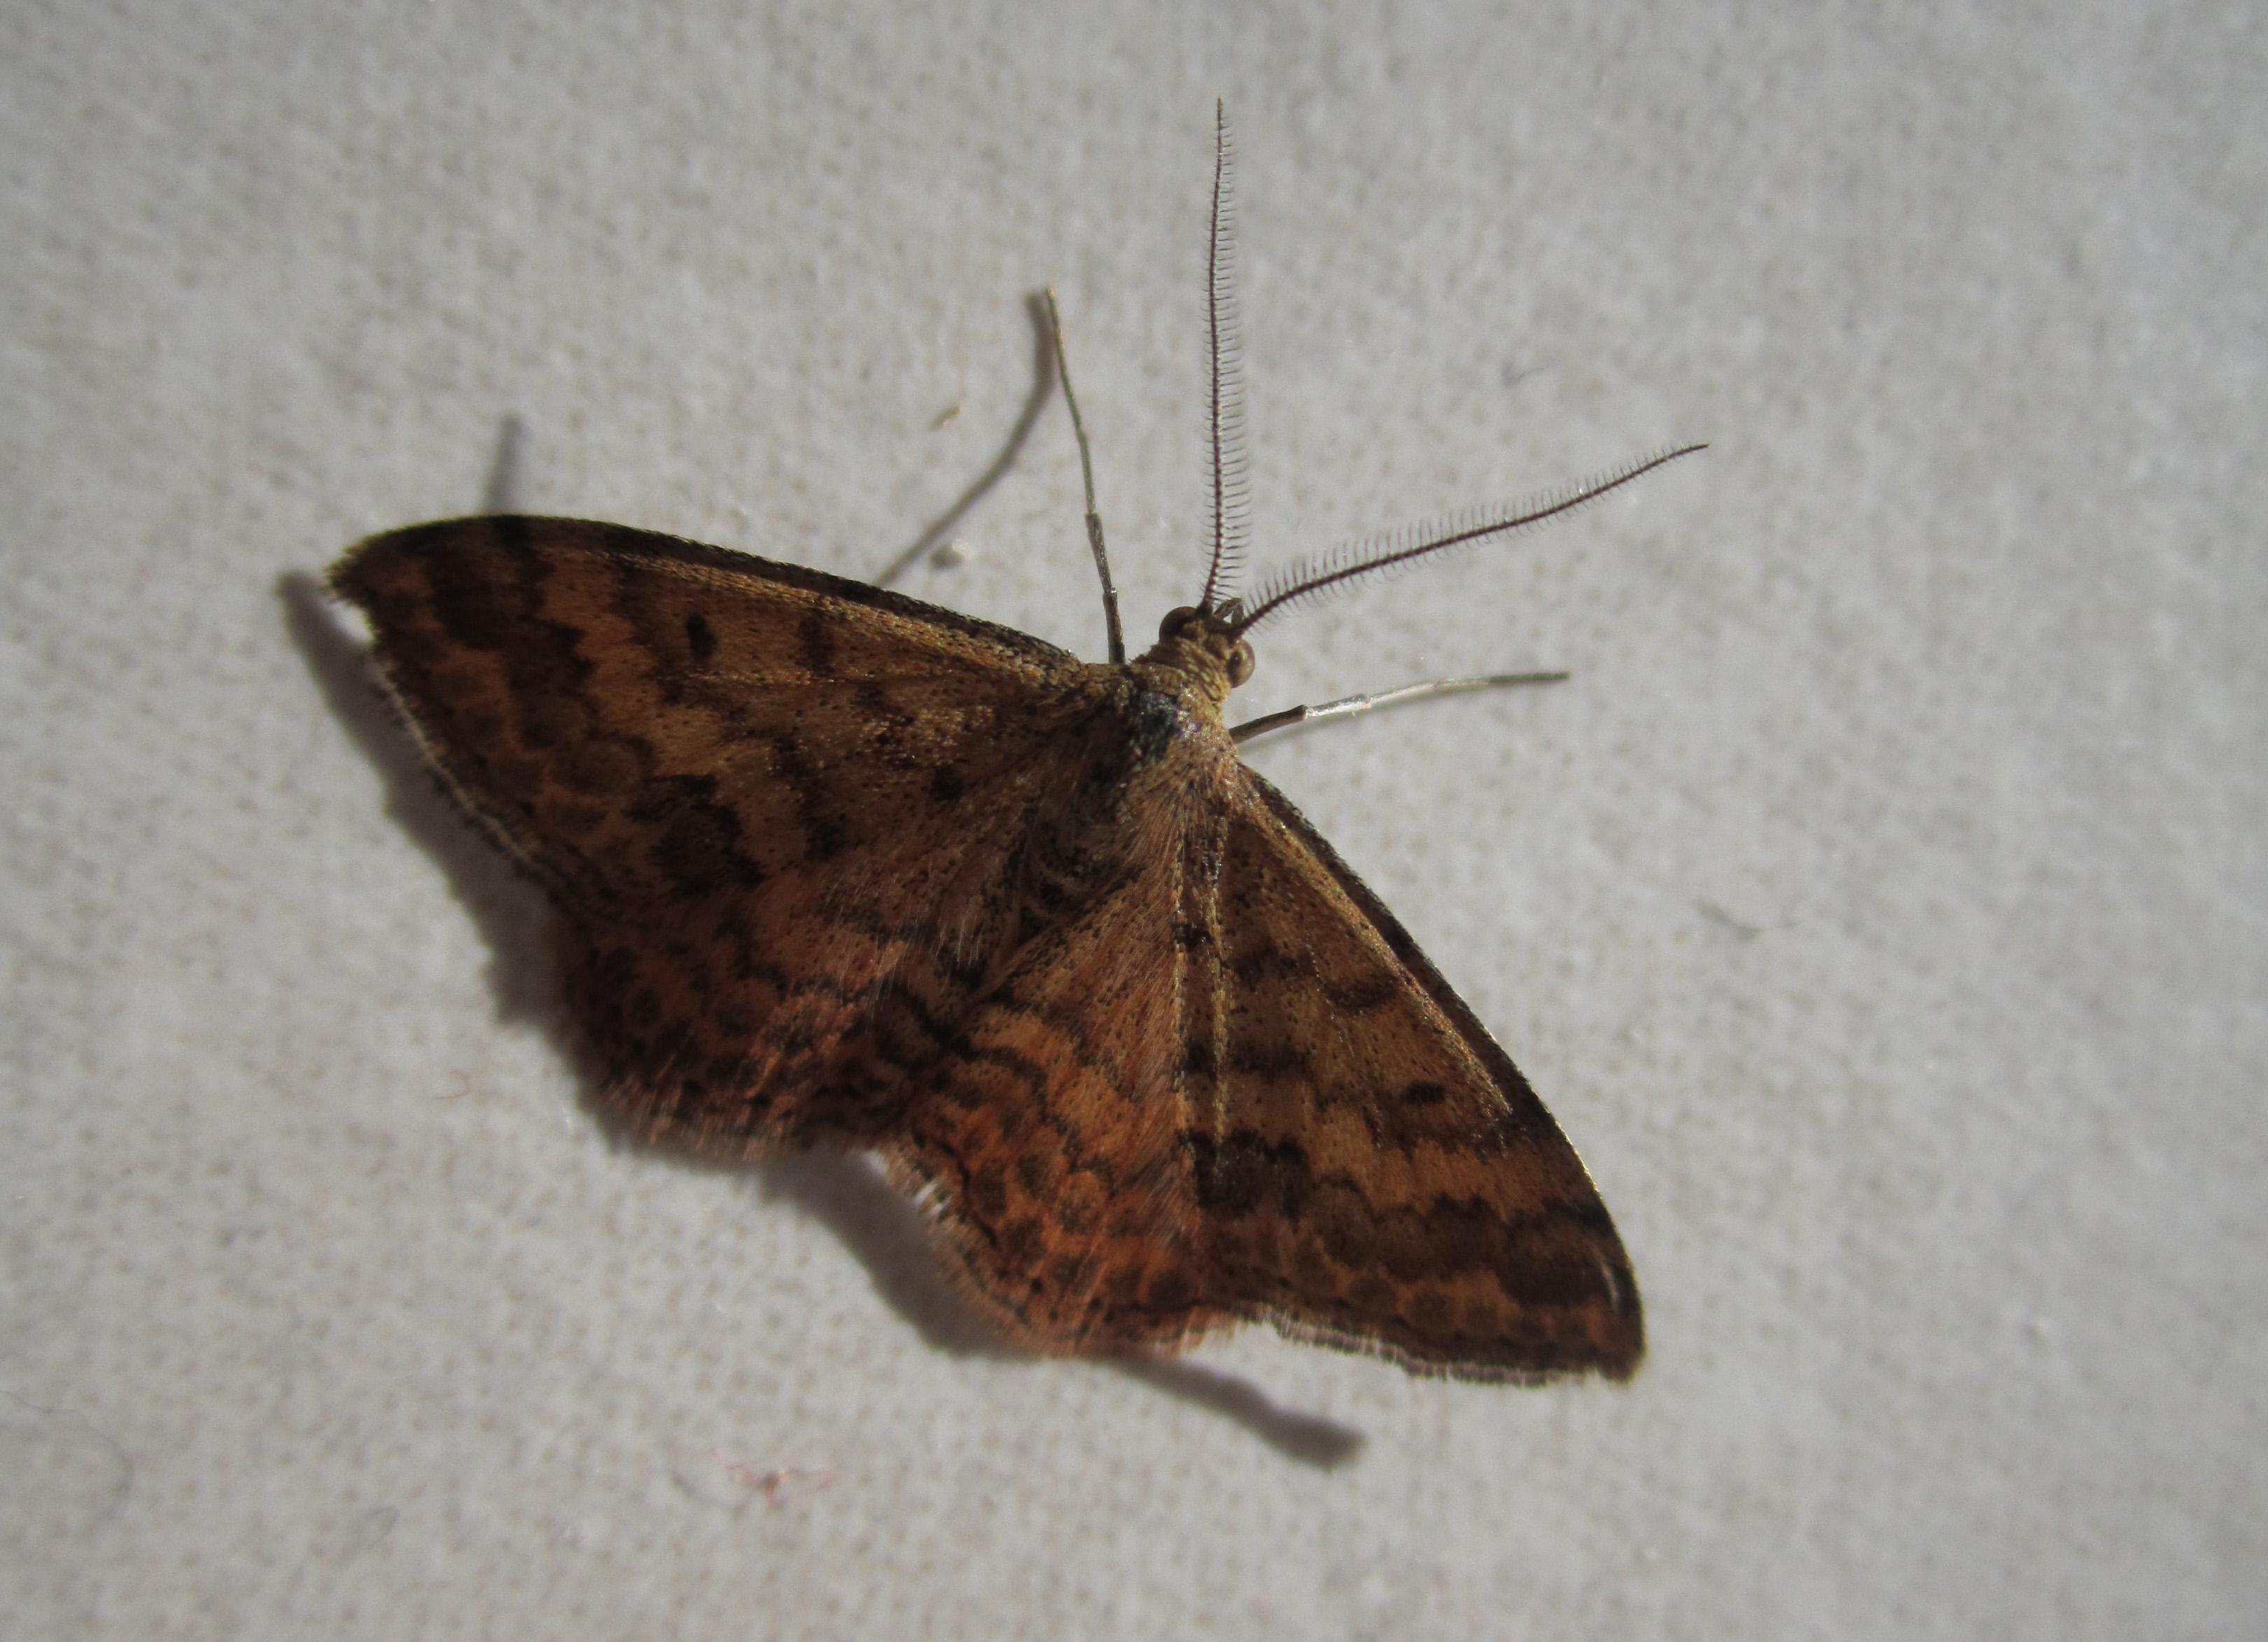 File:Brown-black butterfly jpg - Wikimedia Commons